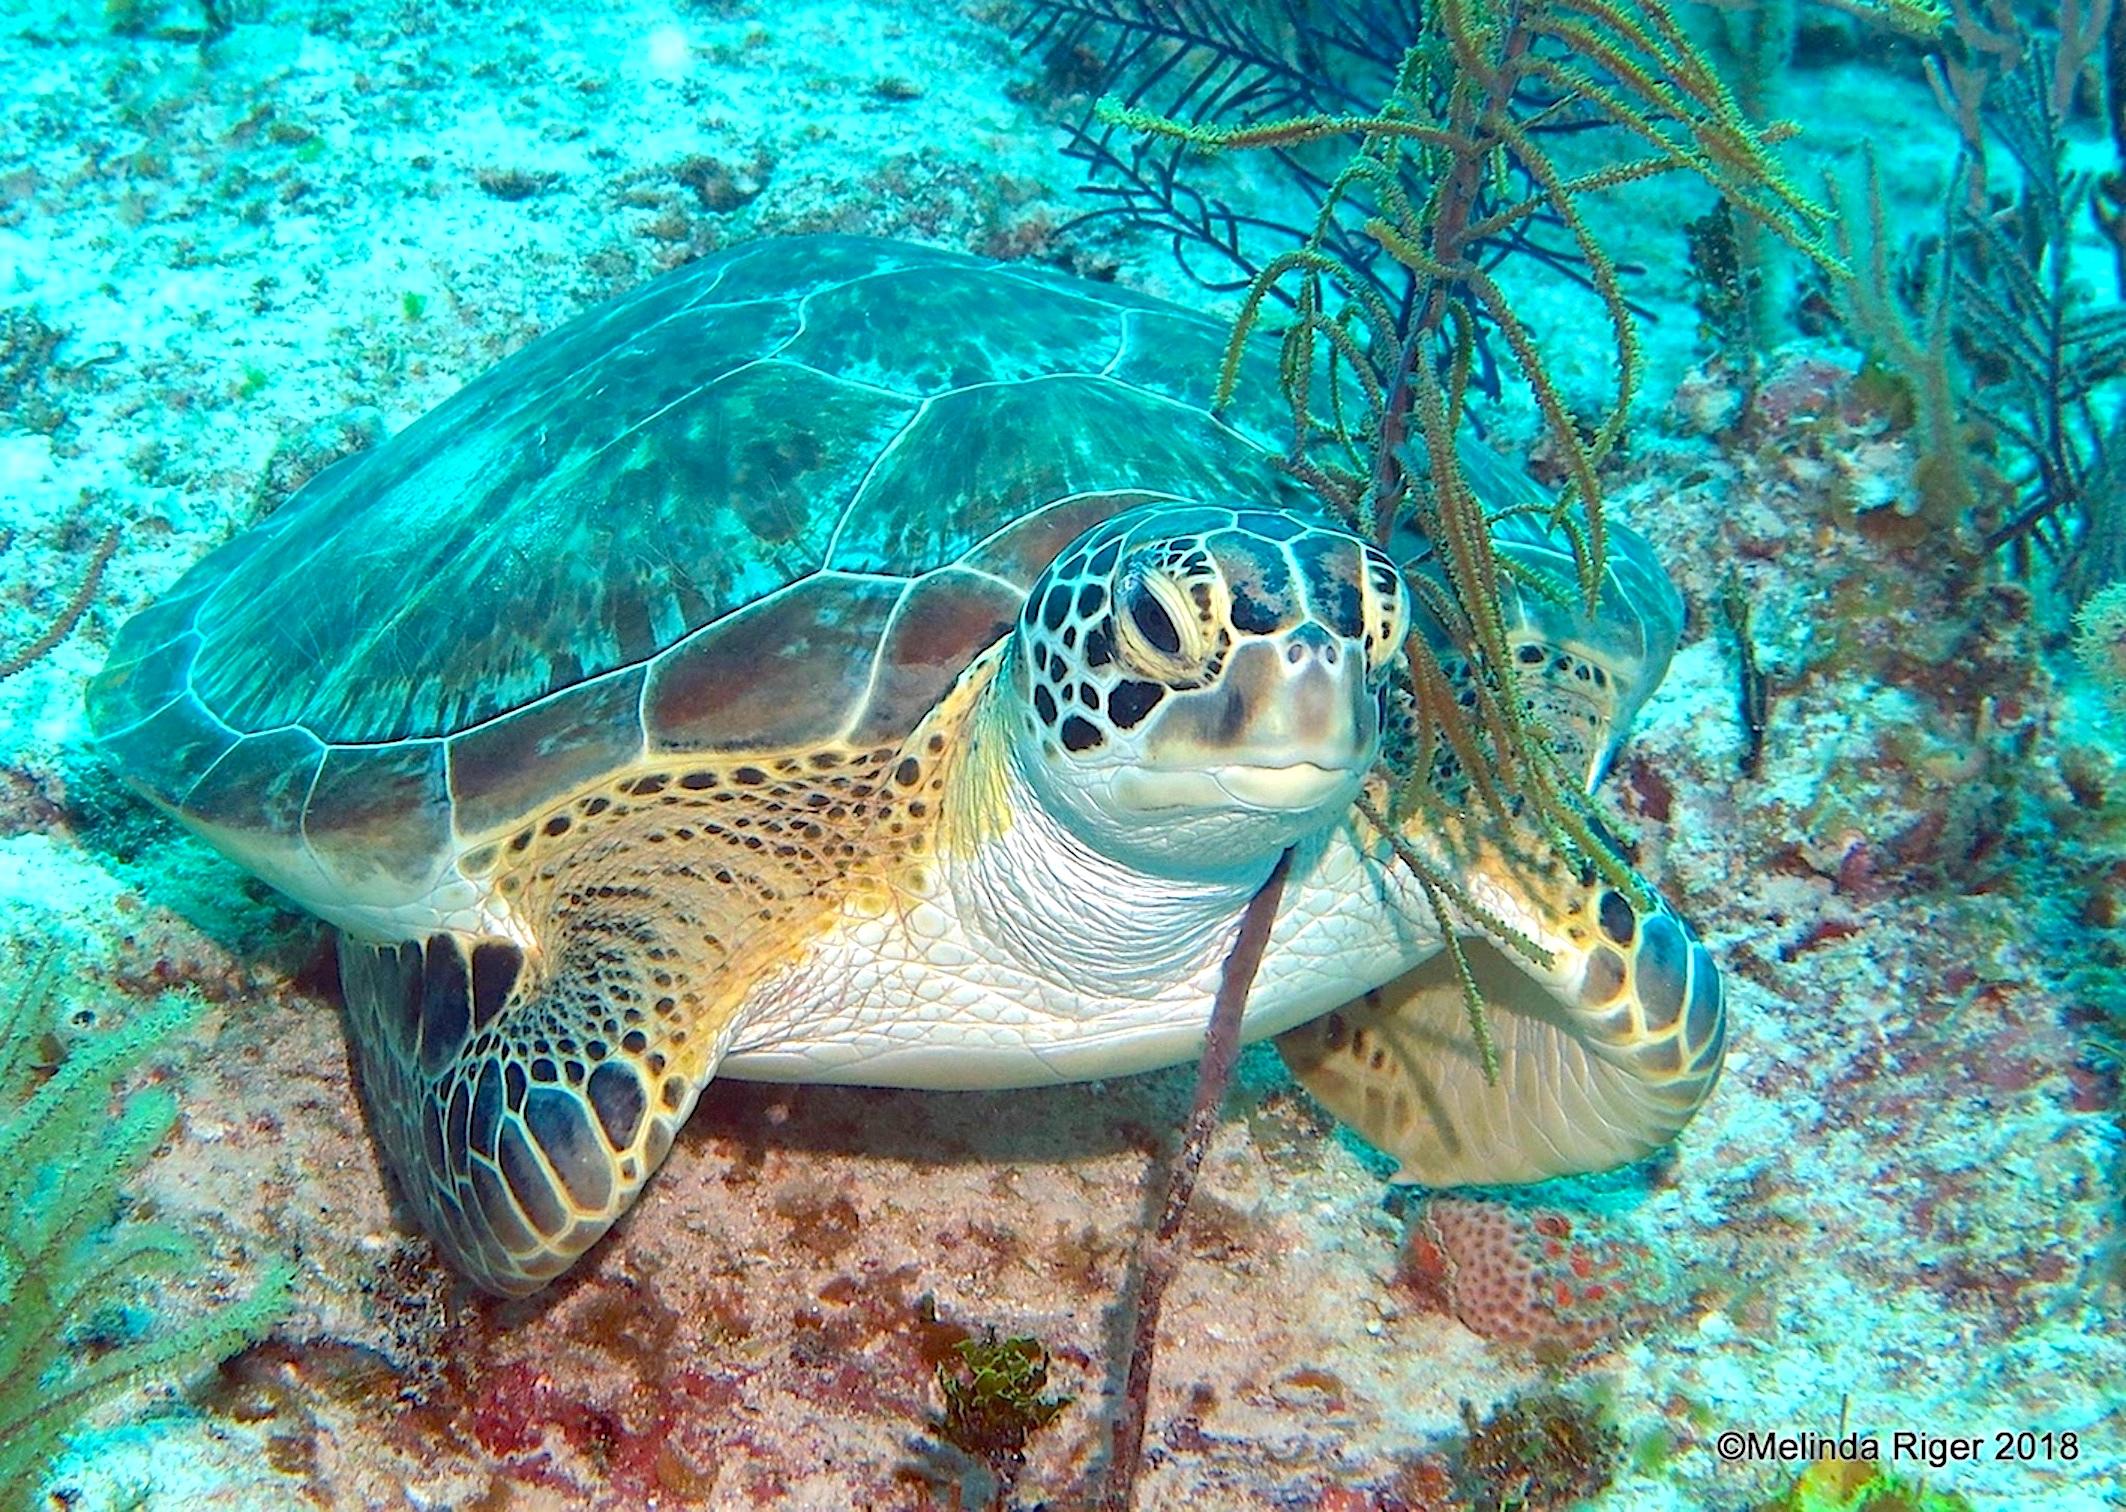 Green Turtle, Bahamas (Melinda Riger / Grand Bahama Scuba)